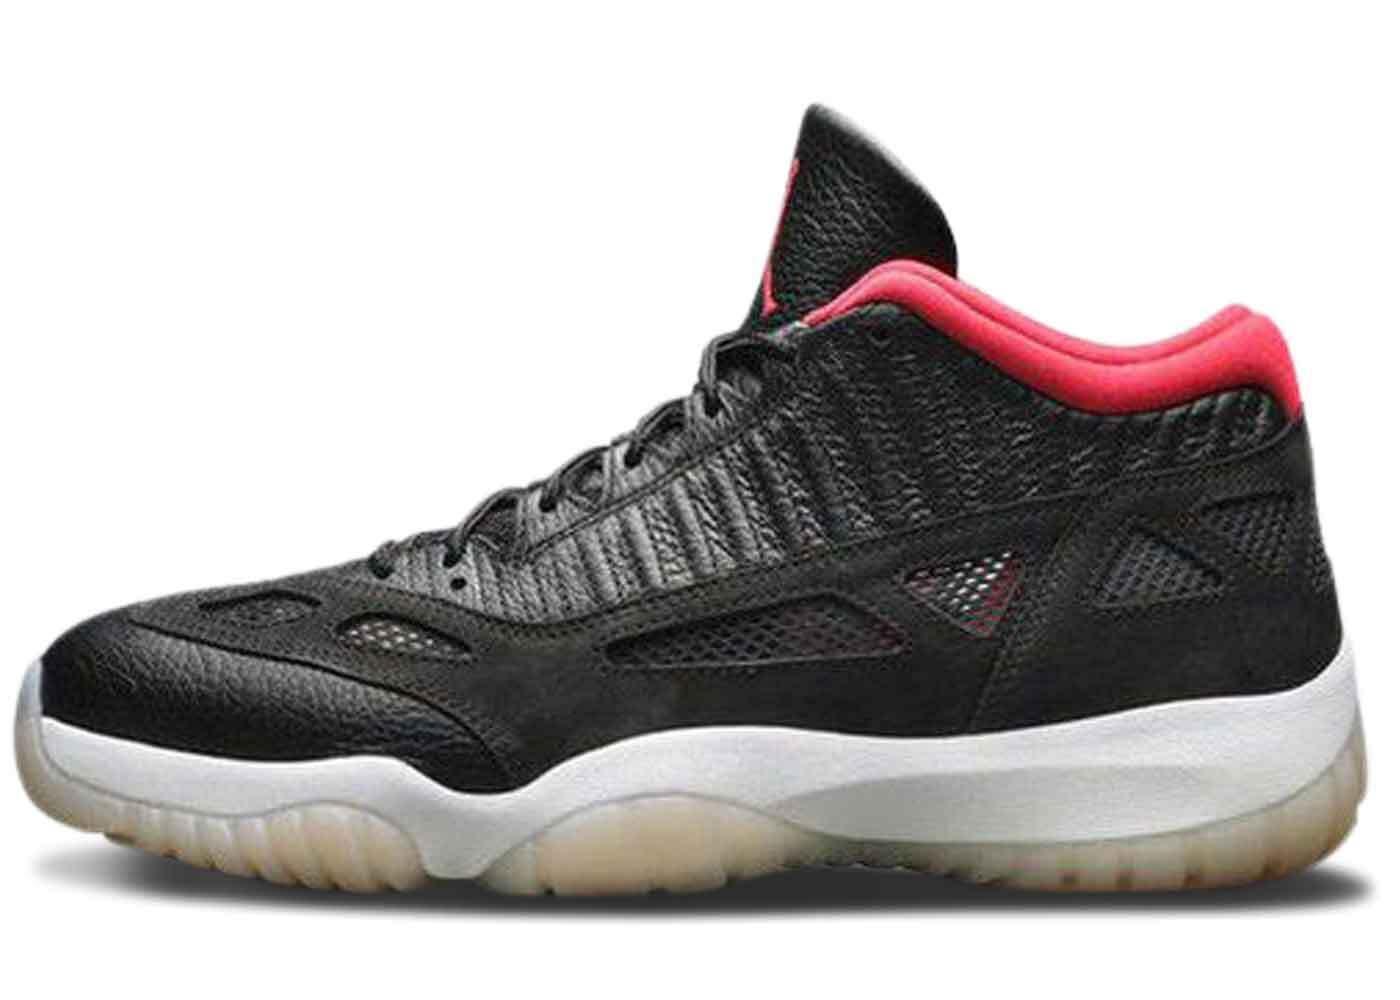 Nike Air Jordan 11 Low IE Bredの写真